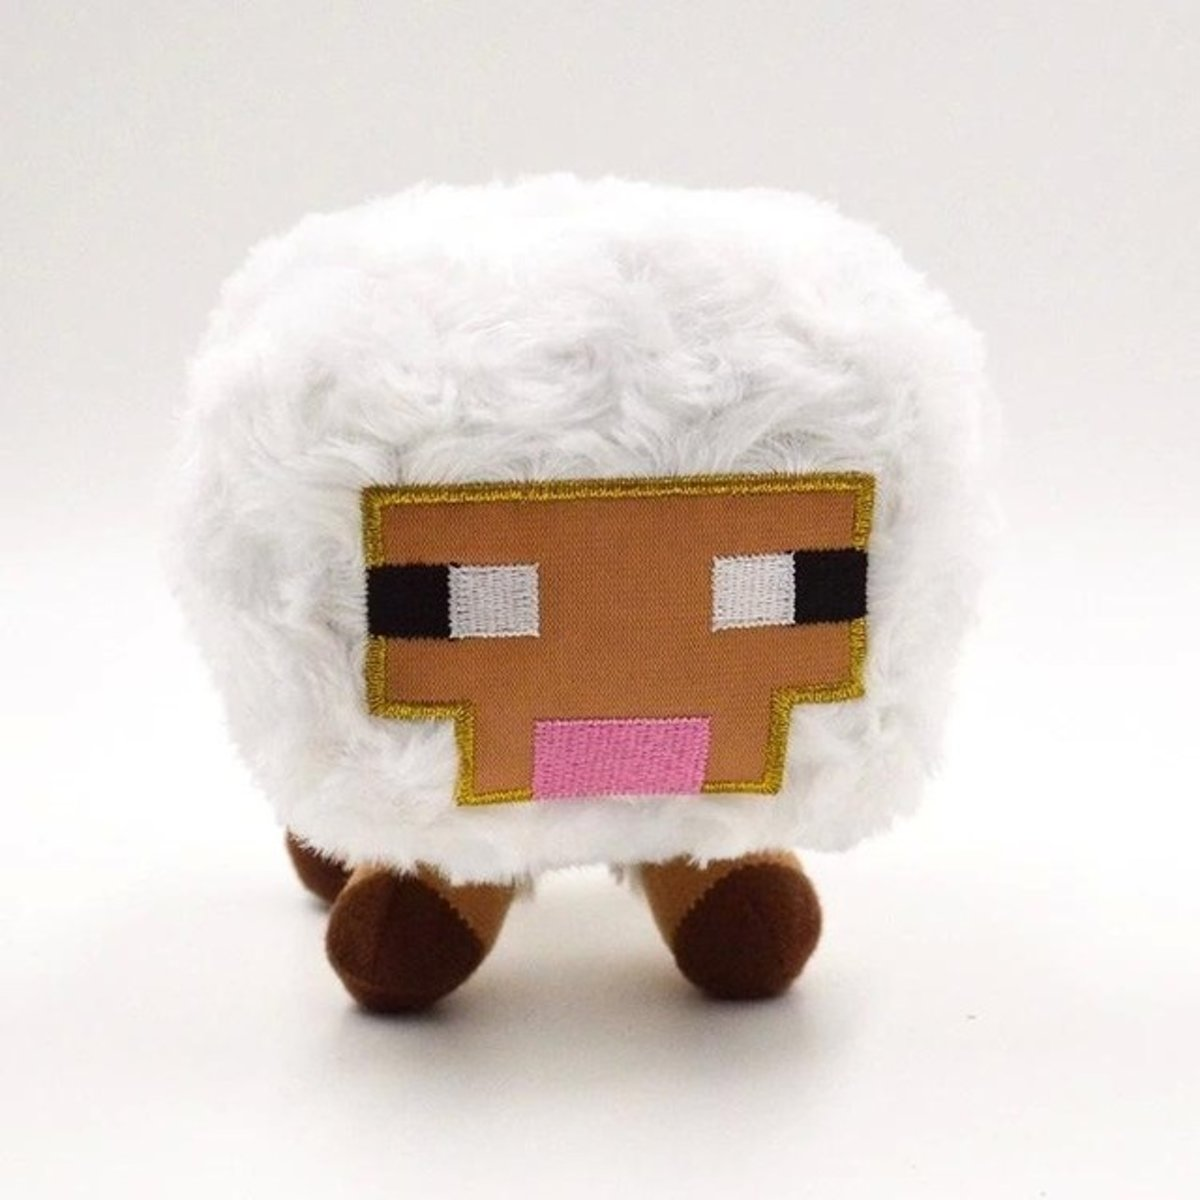 Minecraft Pluche Knuffel - Sheep 16cm.